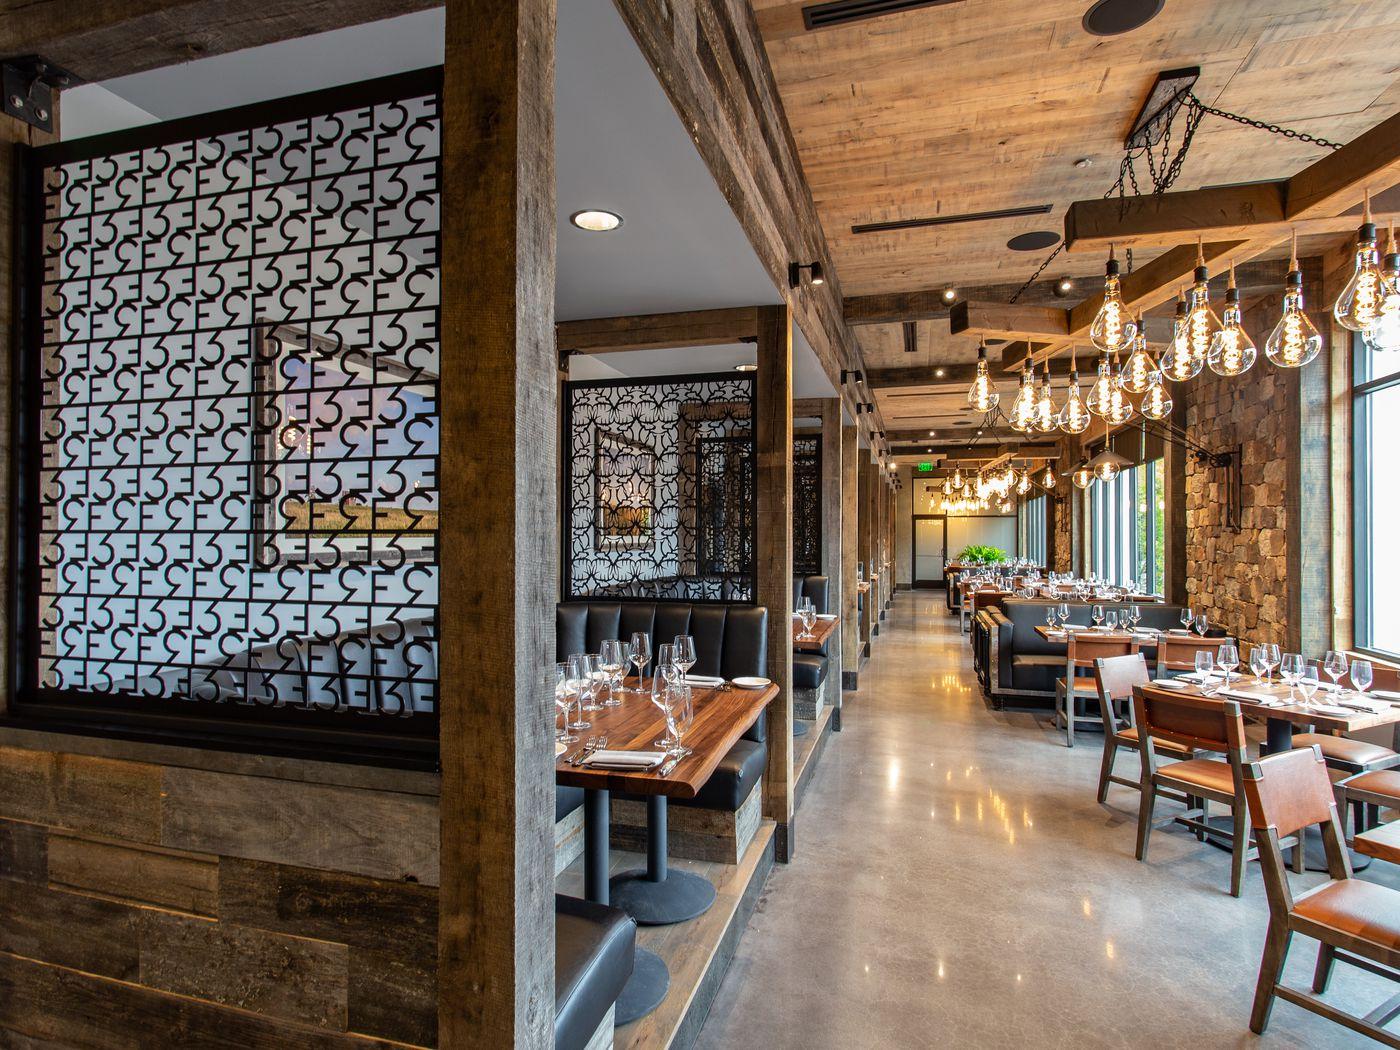 A Glimpse Inside Rustic Chic E3 Chophouse Opening Tonight In Hillsboro Village Eater Nashville,Parmesan Crusted Chicken Pasta Recipe